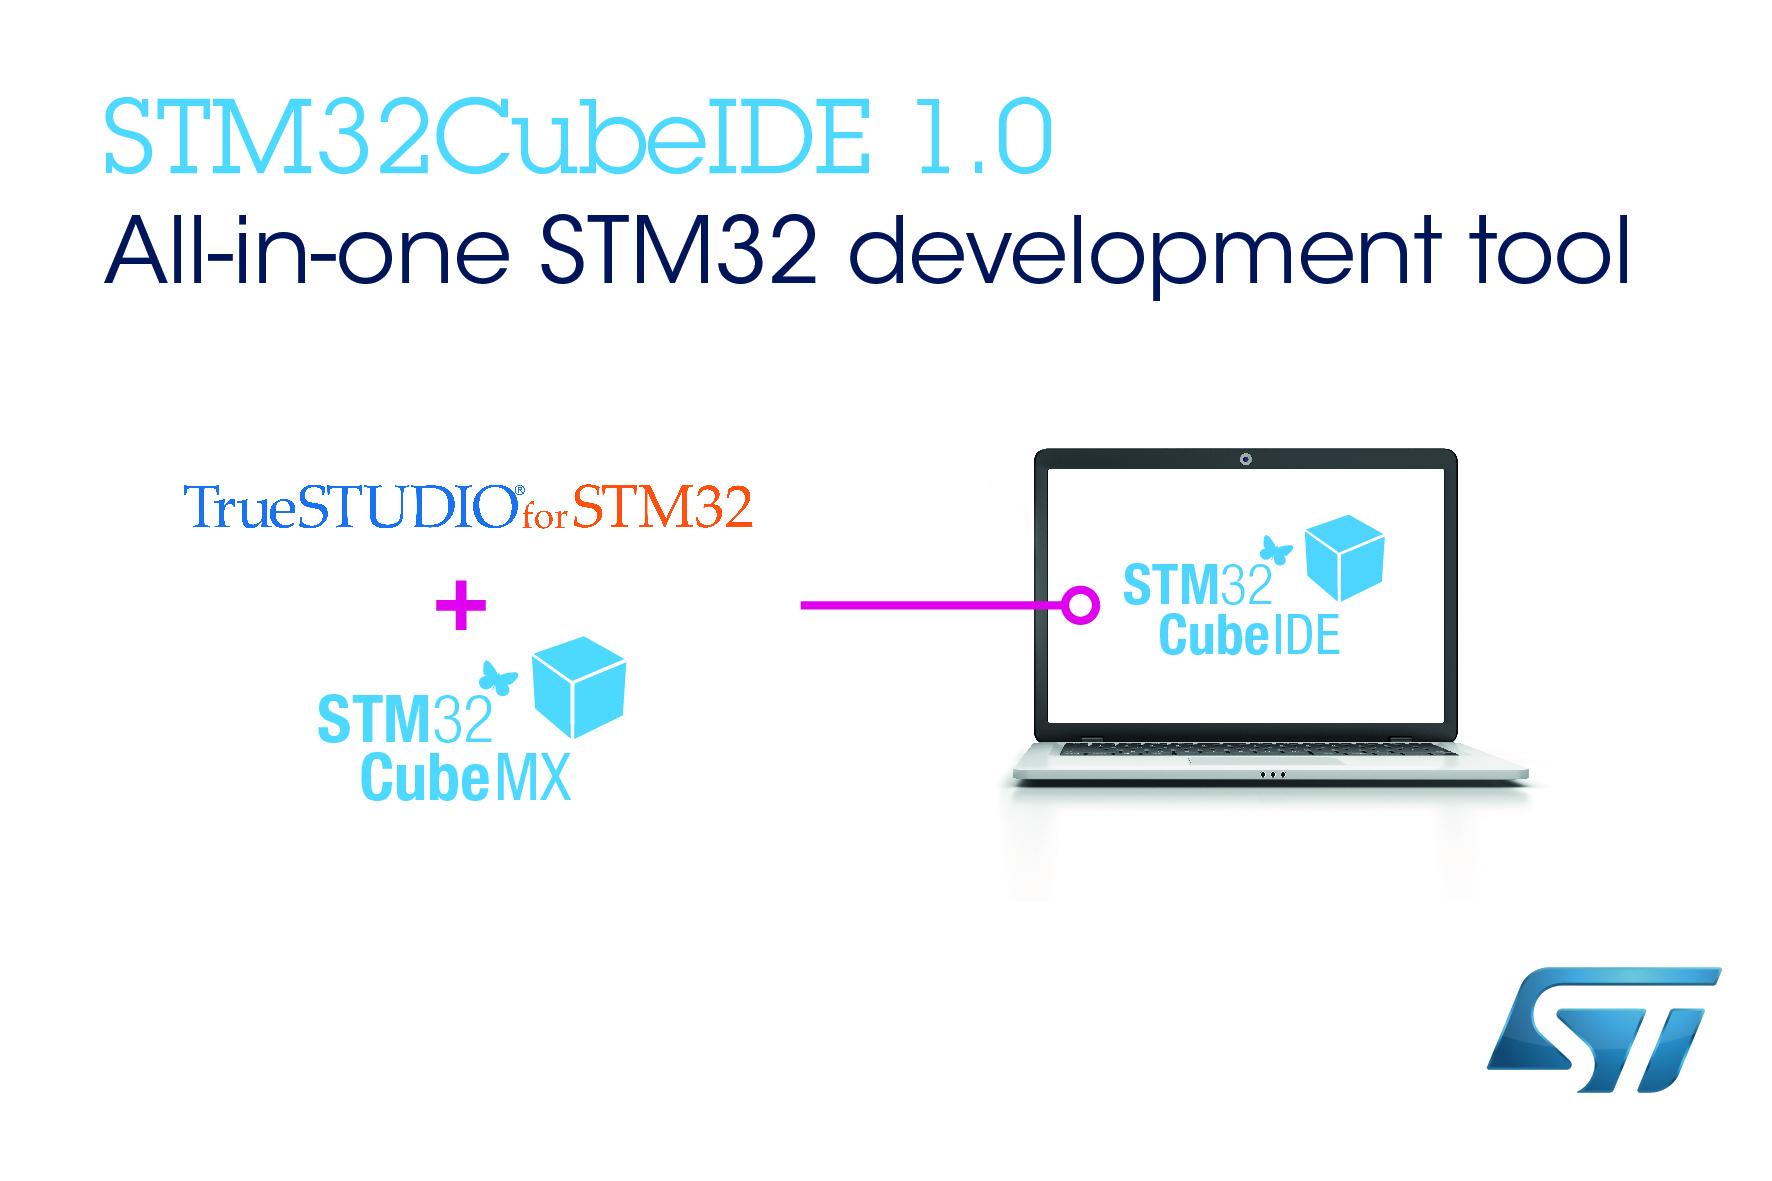 ST offers free STM32 development tool